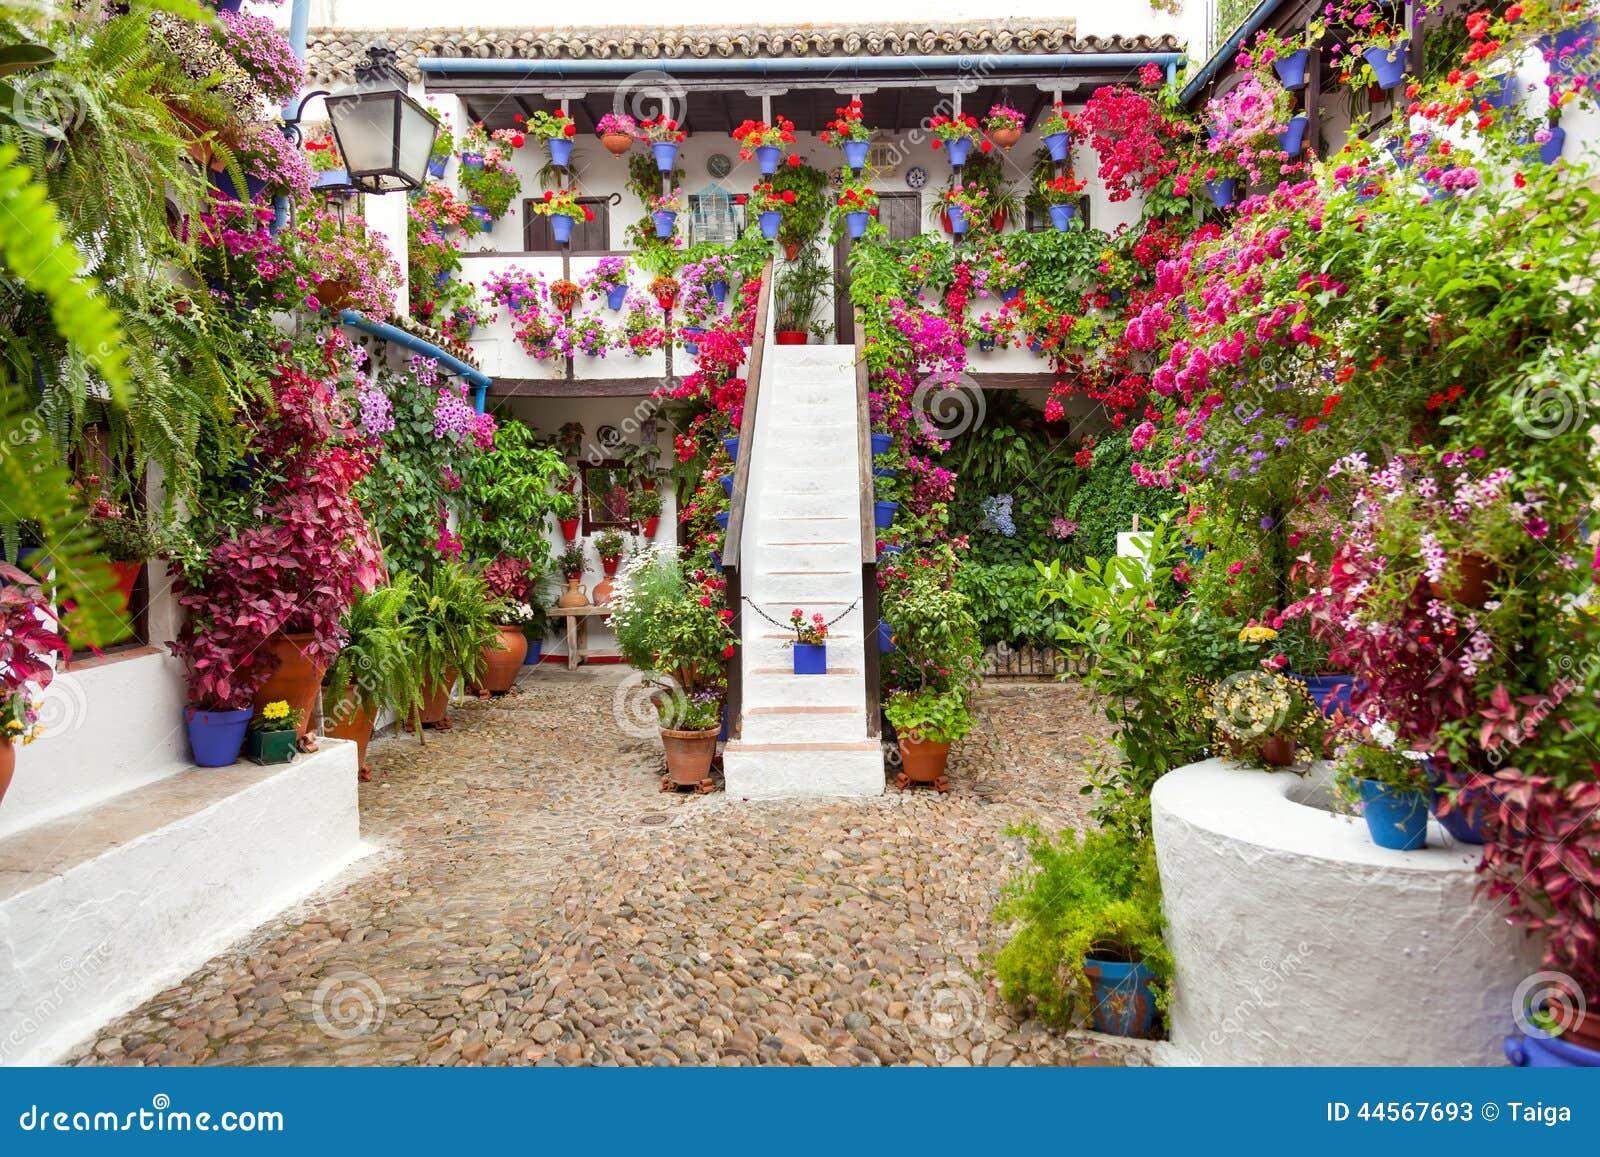 Courtyard with flowers decorated patio fest spain for Fotos de patios